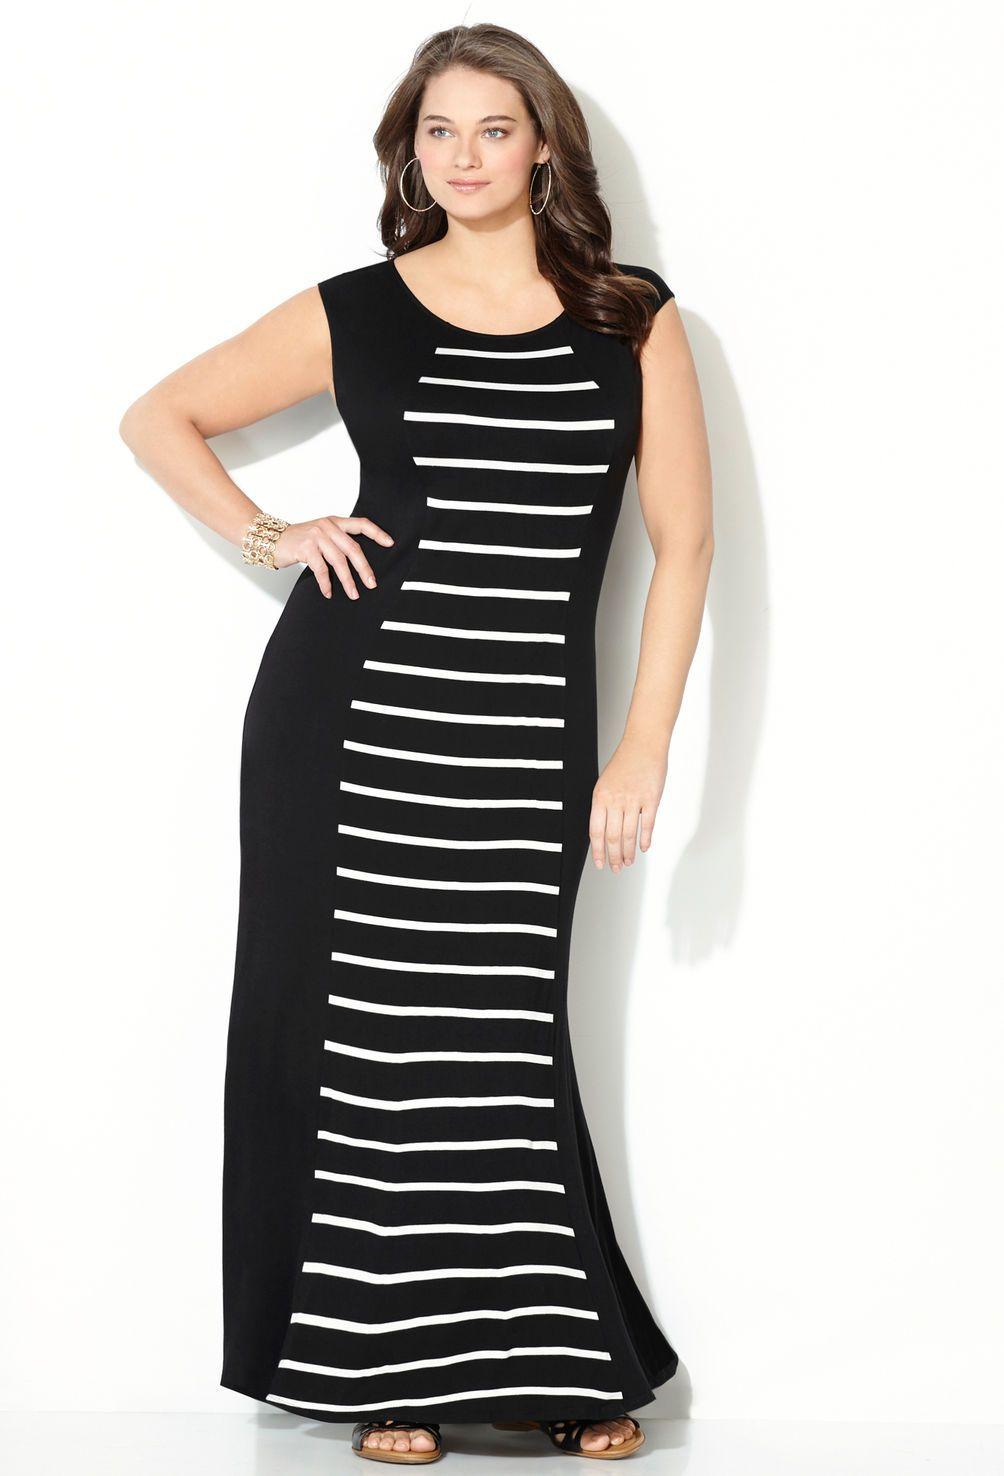 Striped Center Maxi Dress-Plus Size Dress-Avenue | Full on ...